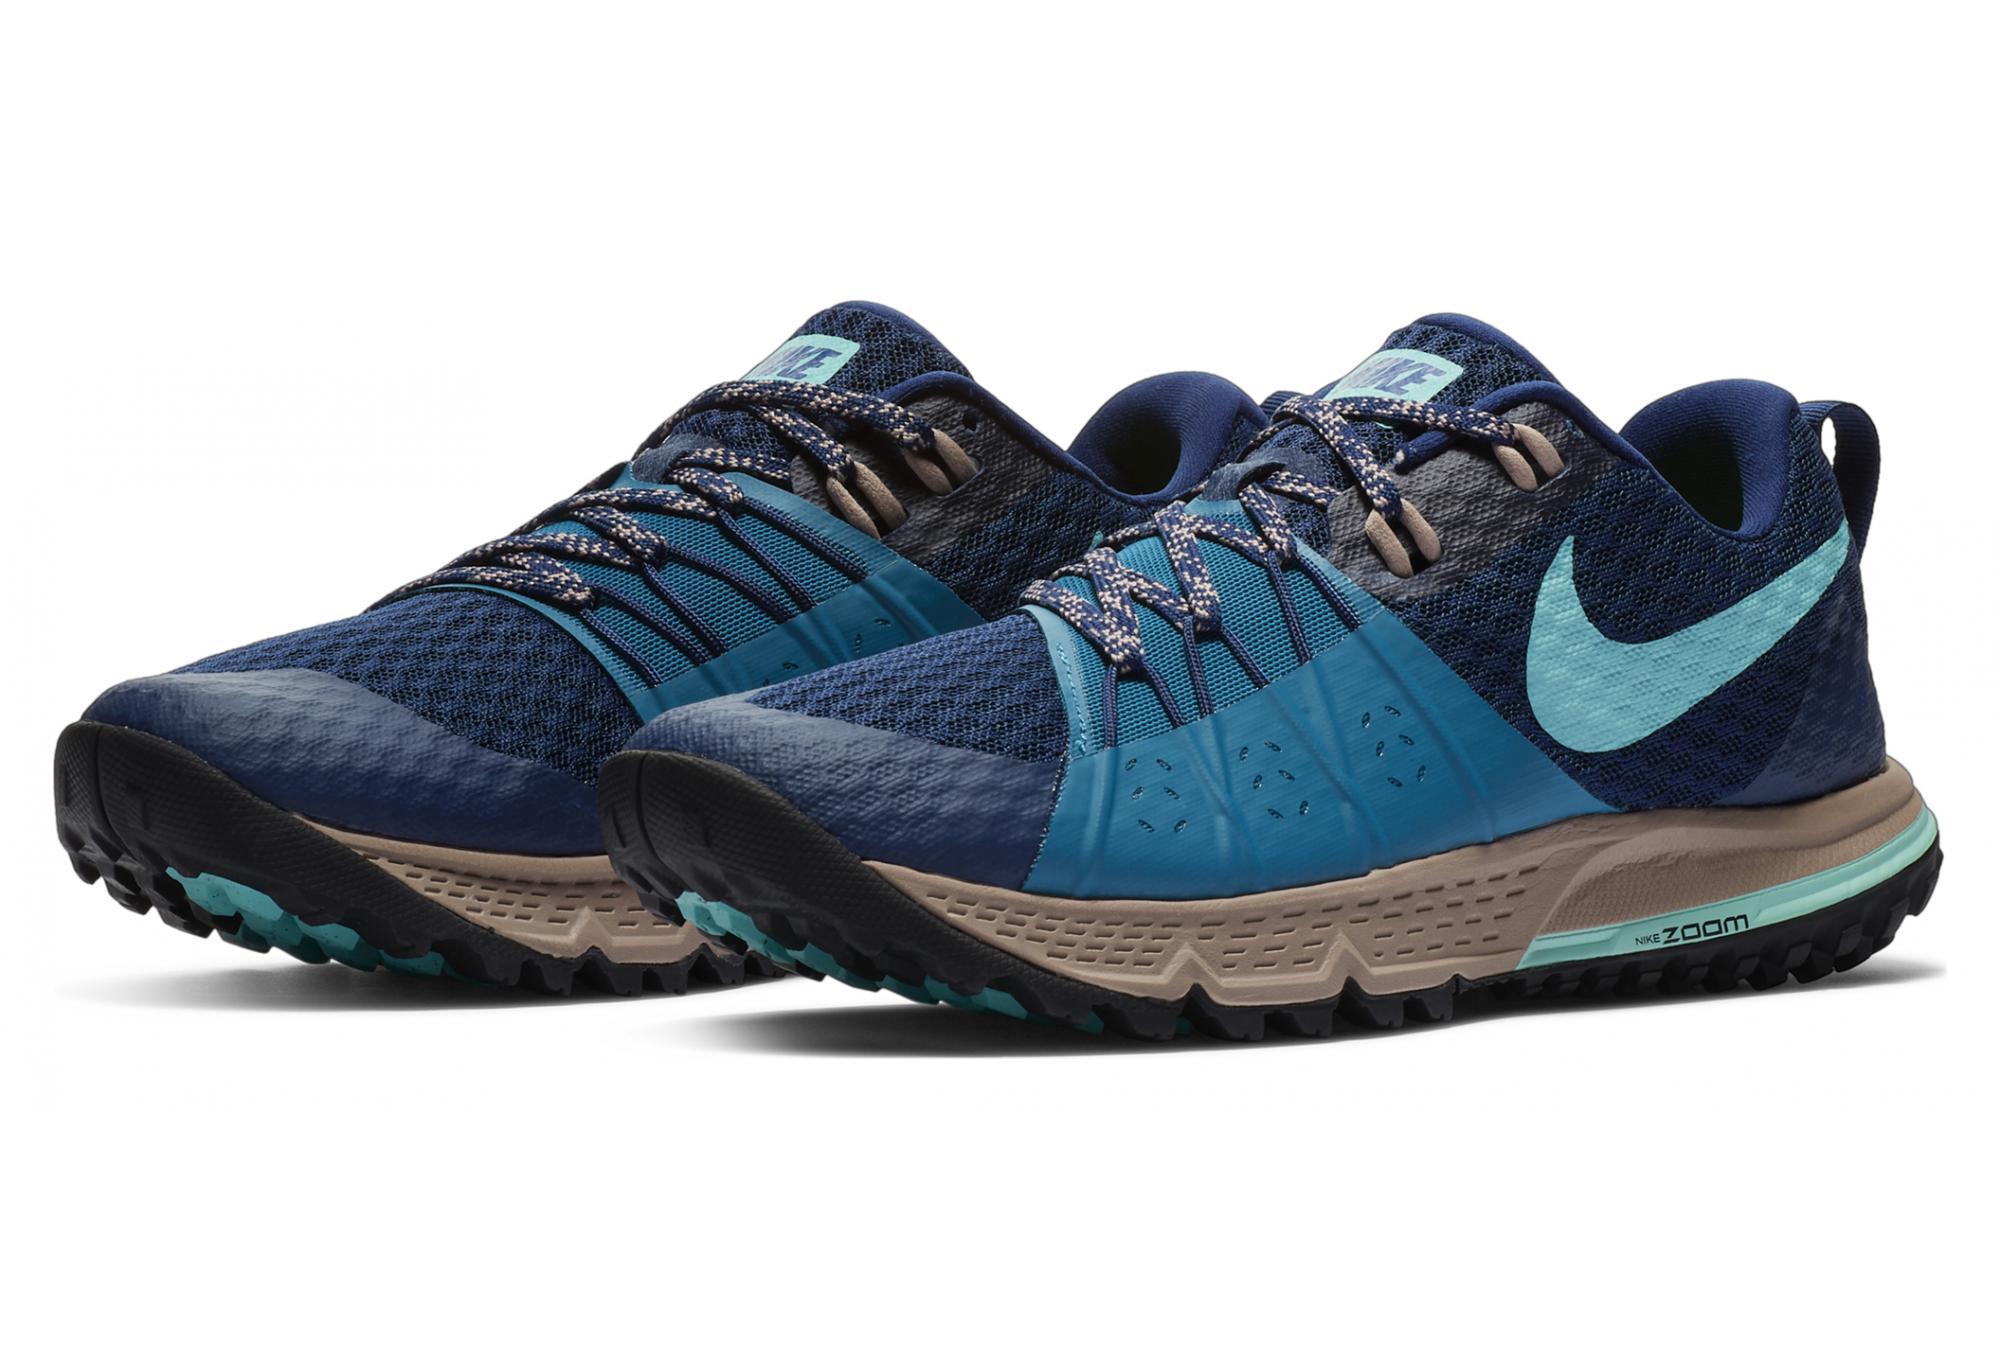 Wildhorse Zoom Nike Blau Schuhe Damen Air 4 9eEbDIYWH2